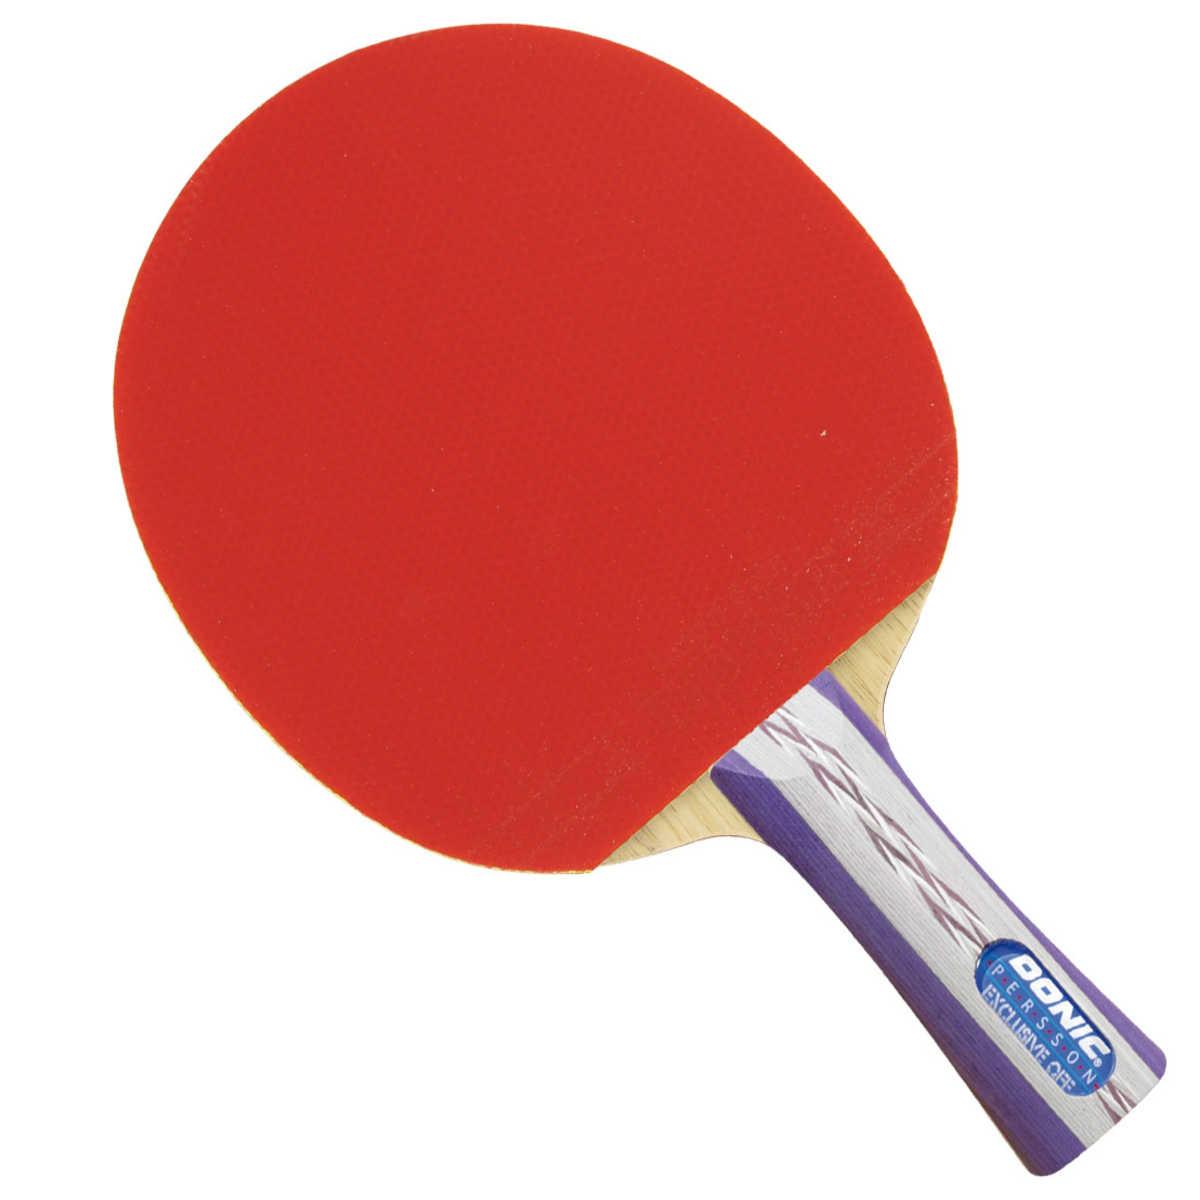 Donic tennis de table raq persson exclusif off liga 1 - Choisir sa raquette de tennis de table ...